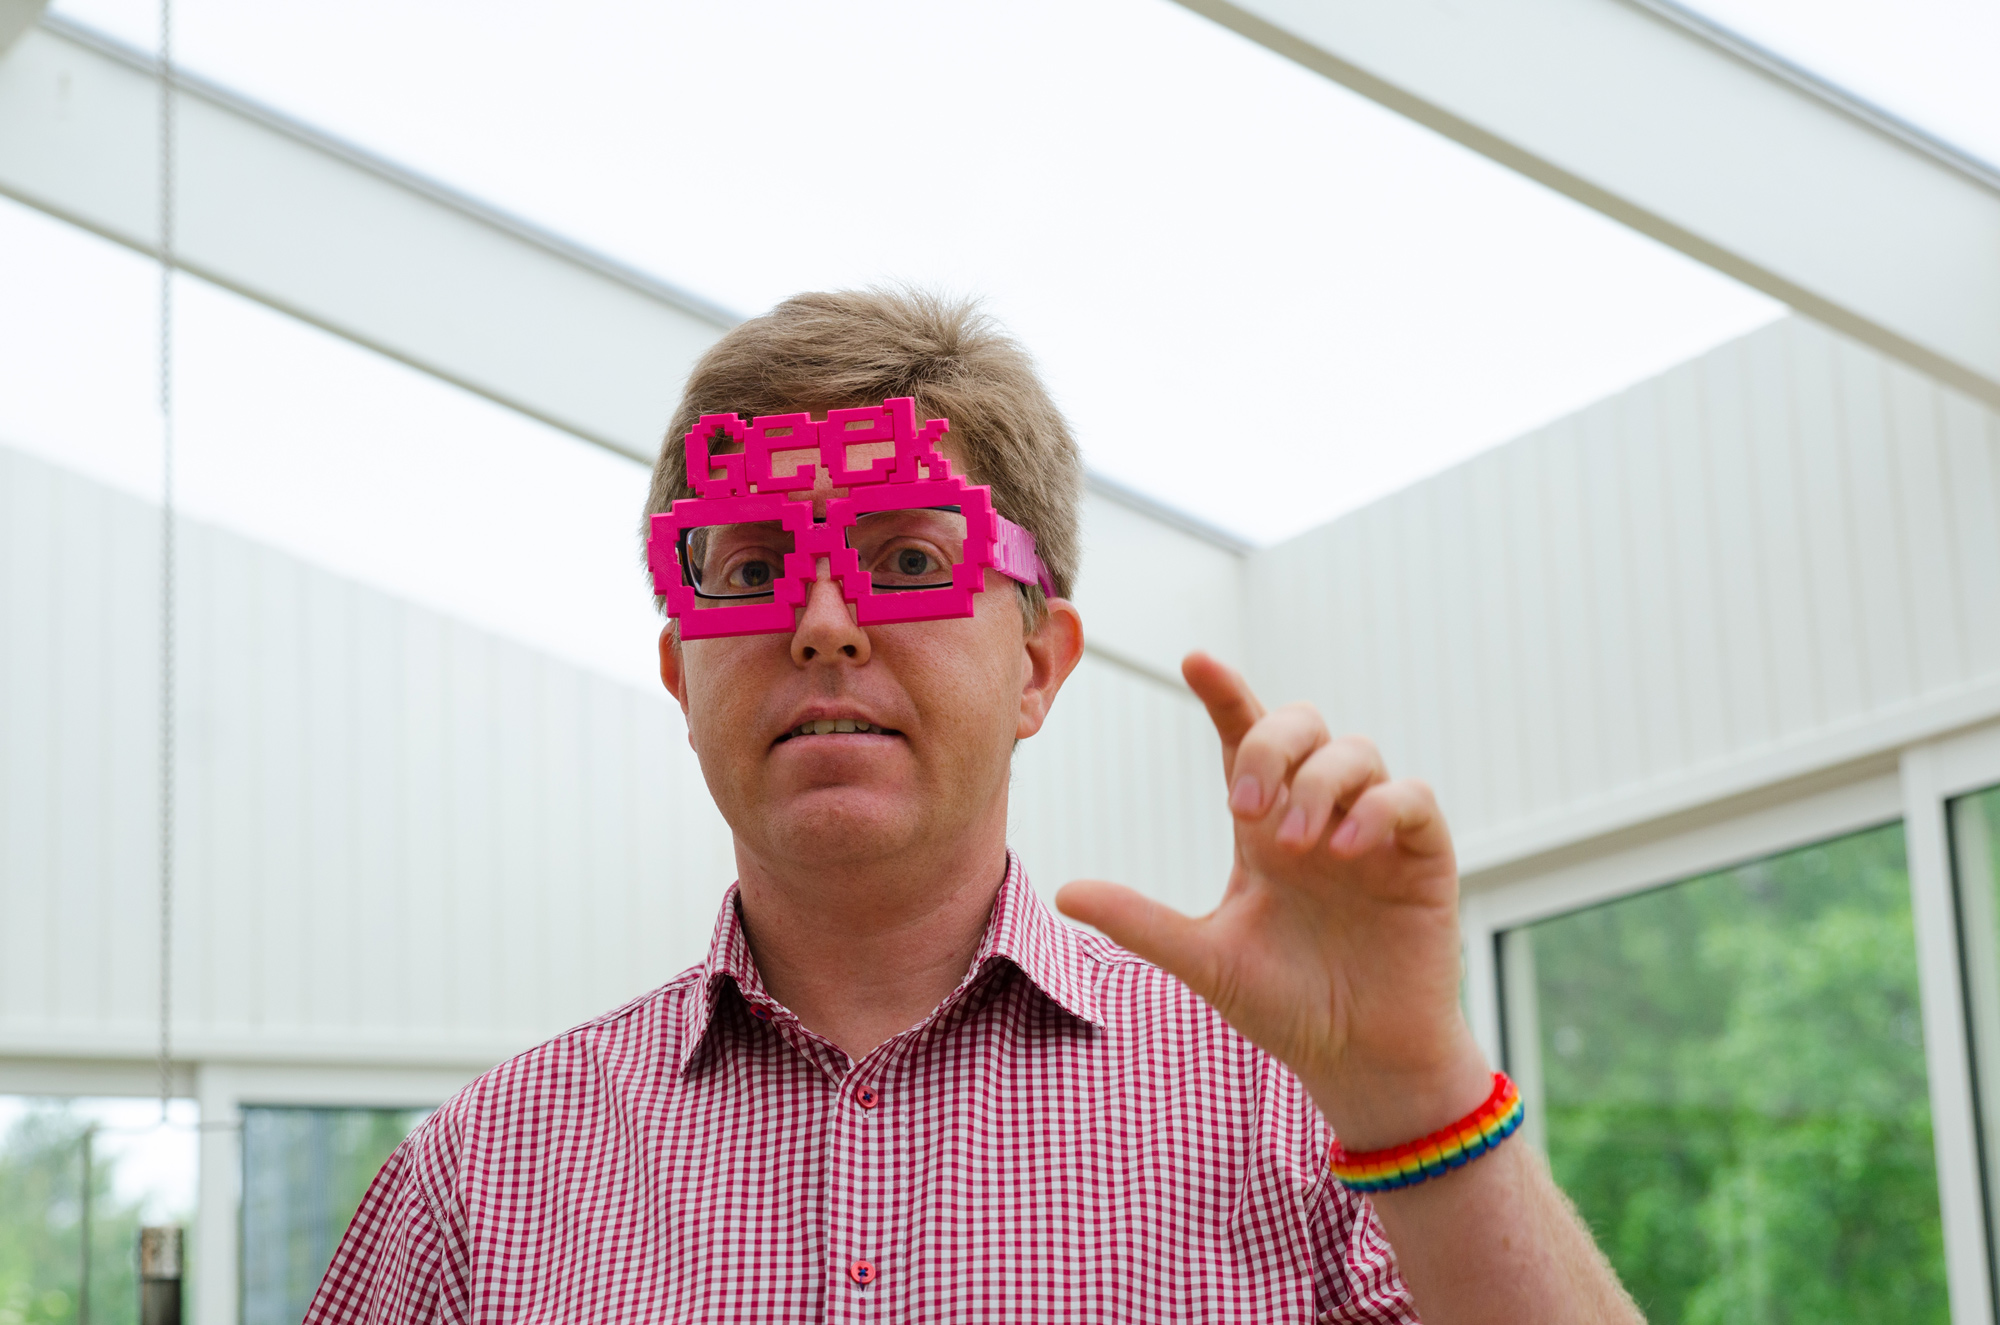 Peter Parnes visar ett par Geek Pride glasögon, lagom diskreta...